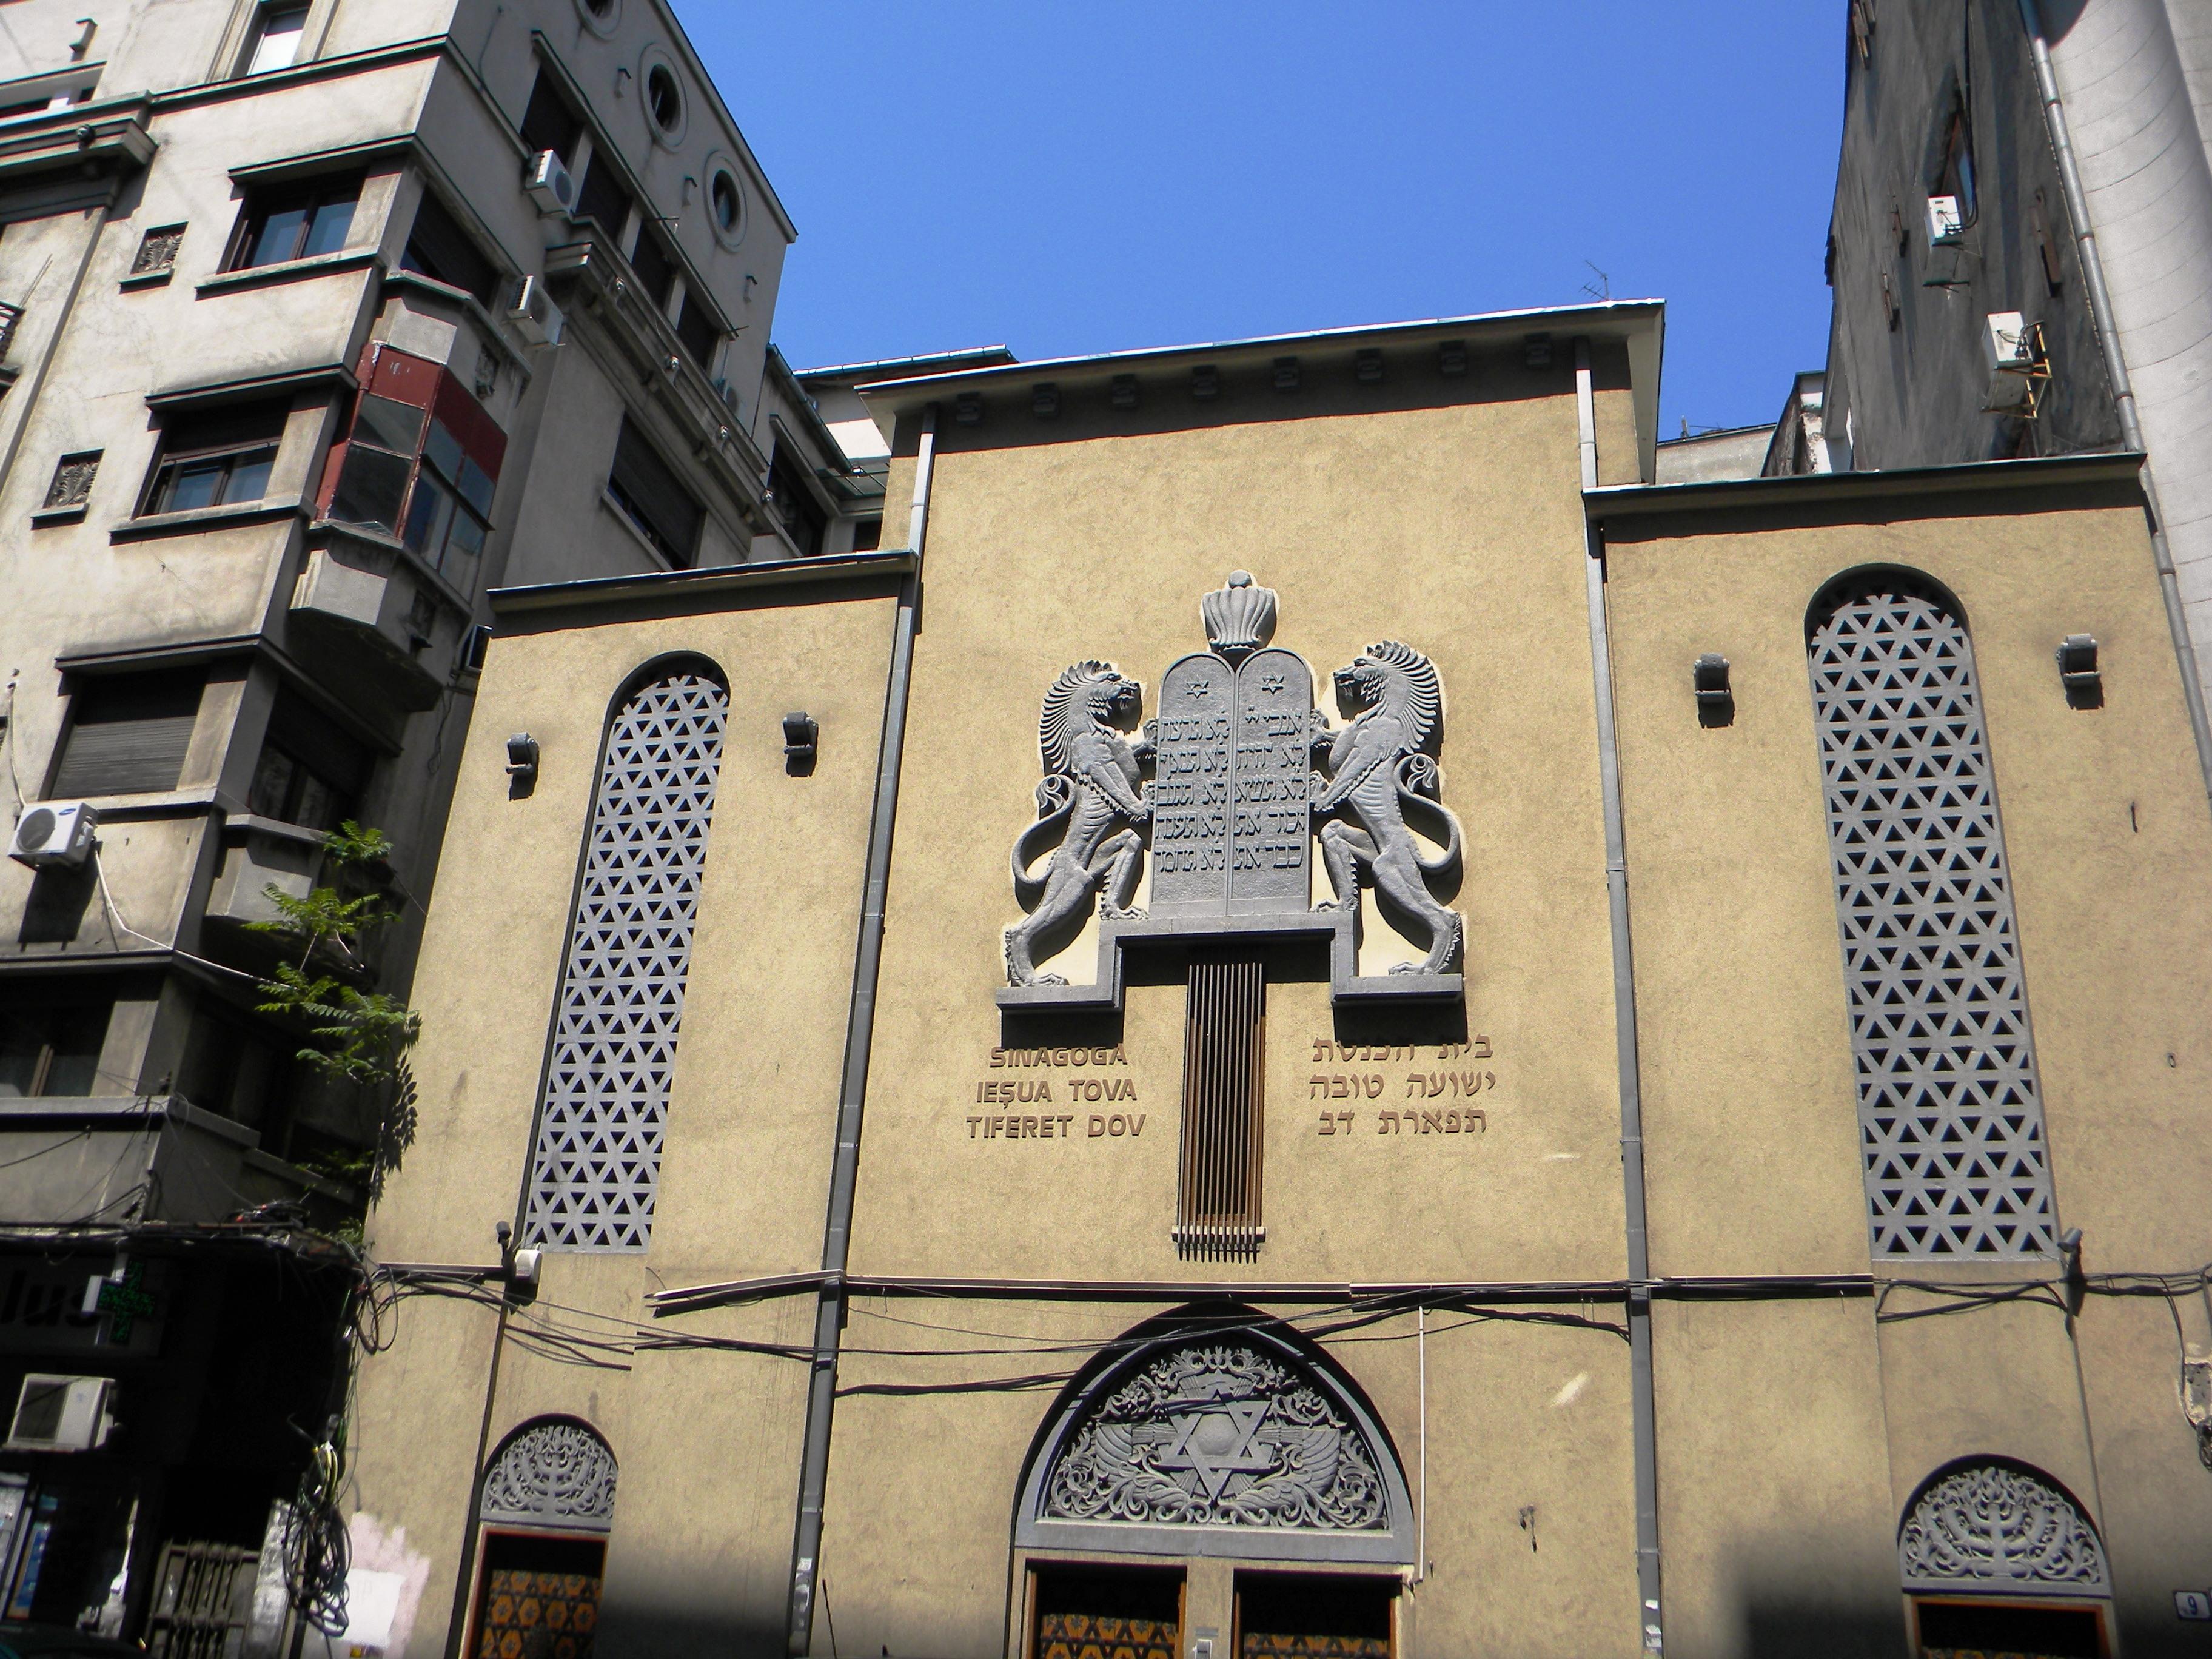 The Yeshua Tova Synagogue